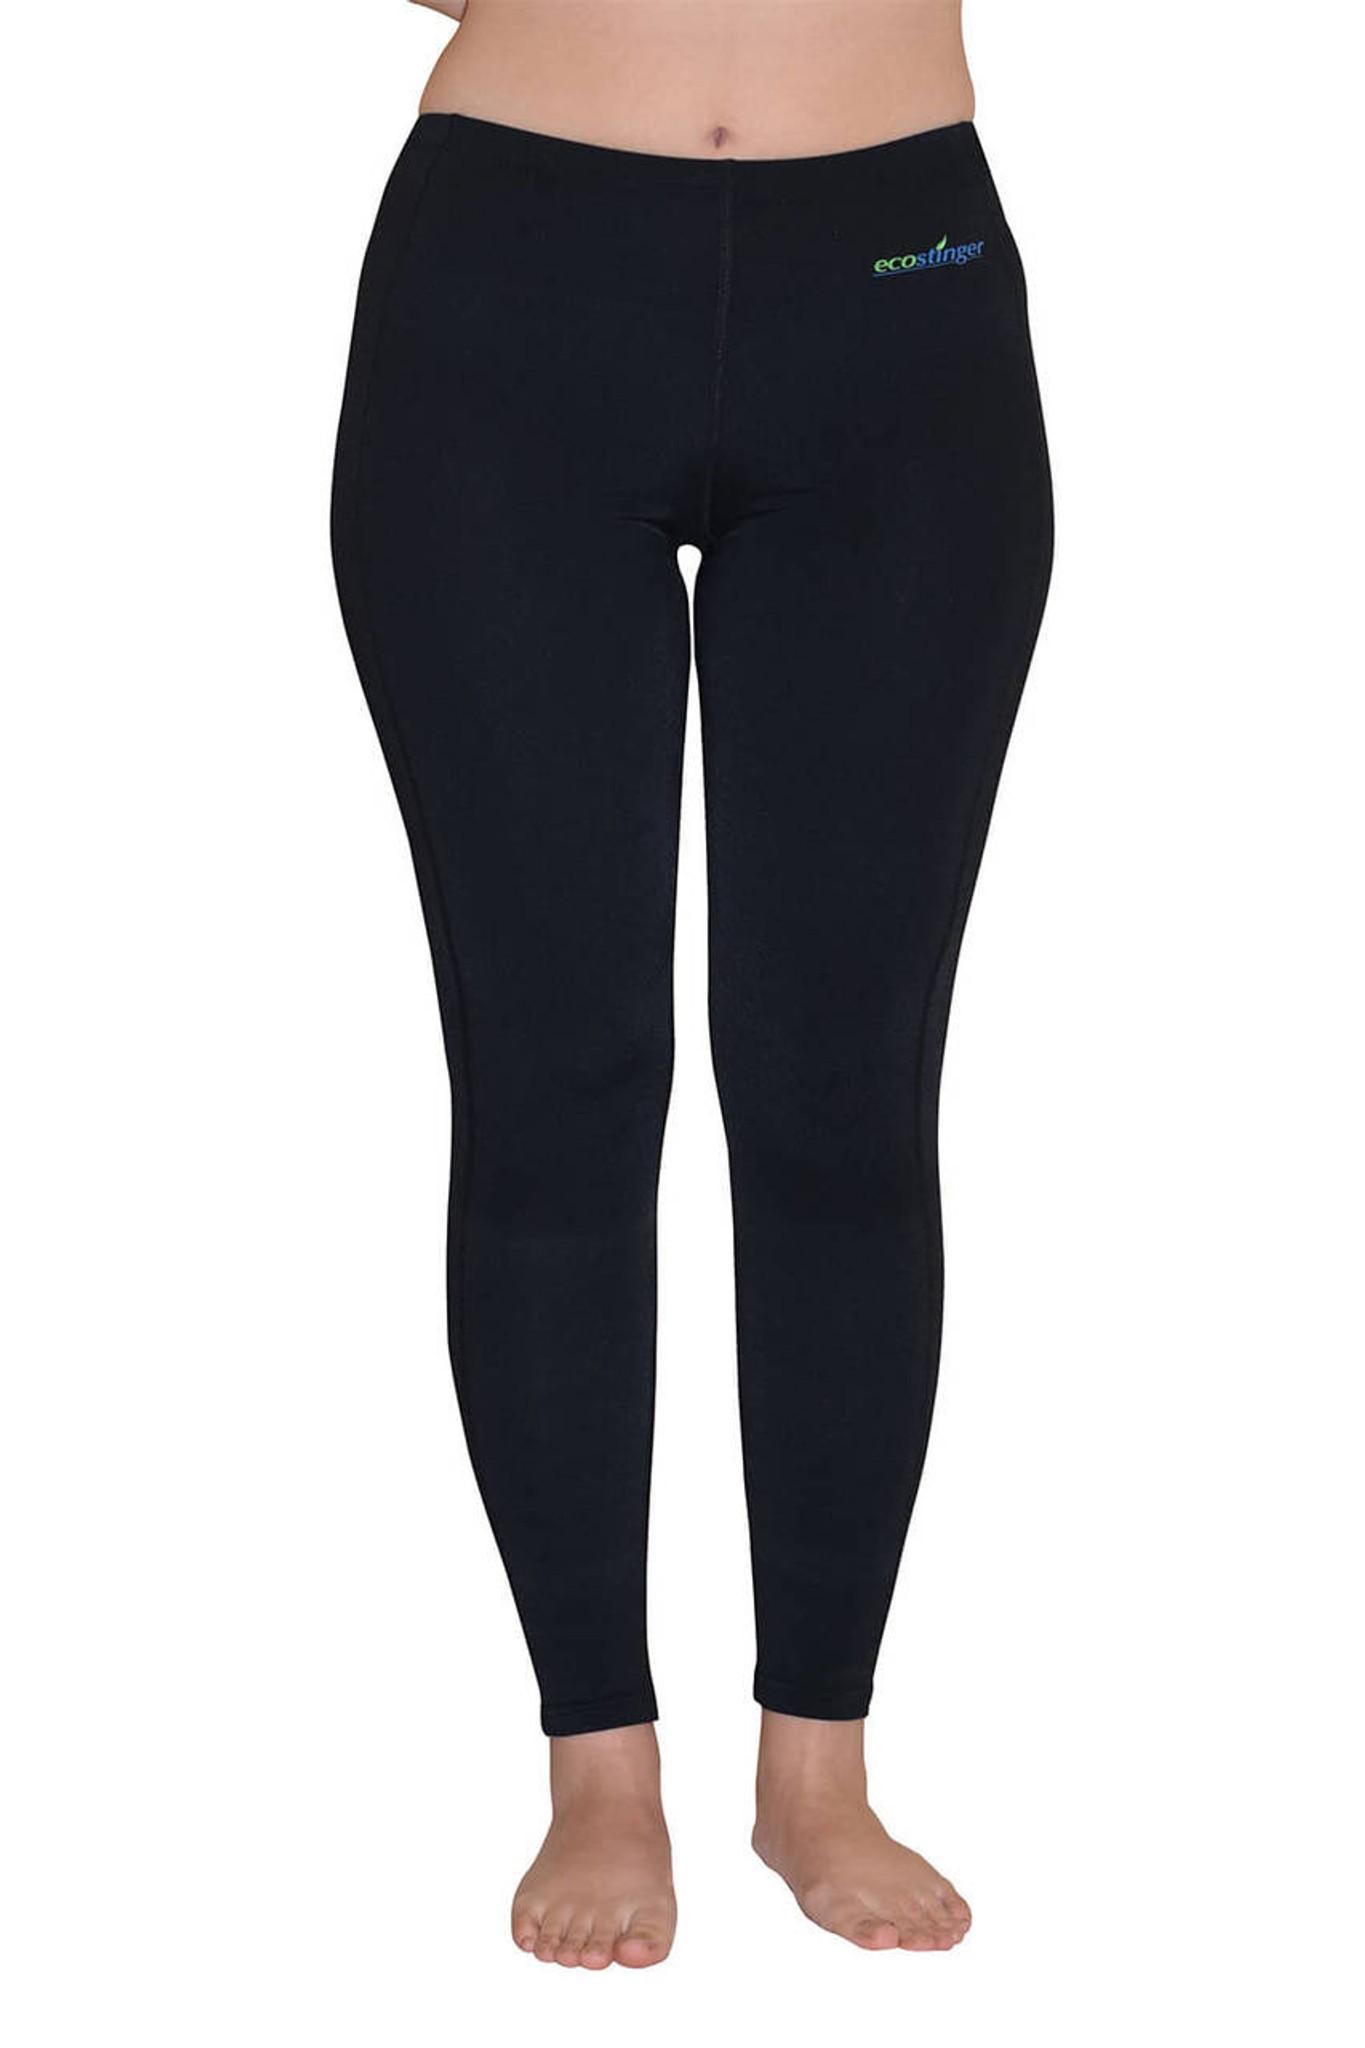 488efcb4b Women UV Protective Swim Tights Full Leggings UPF50+ Black (Chlorine  Resistant)